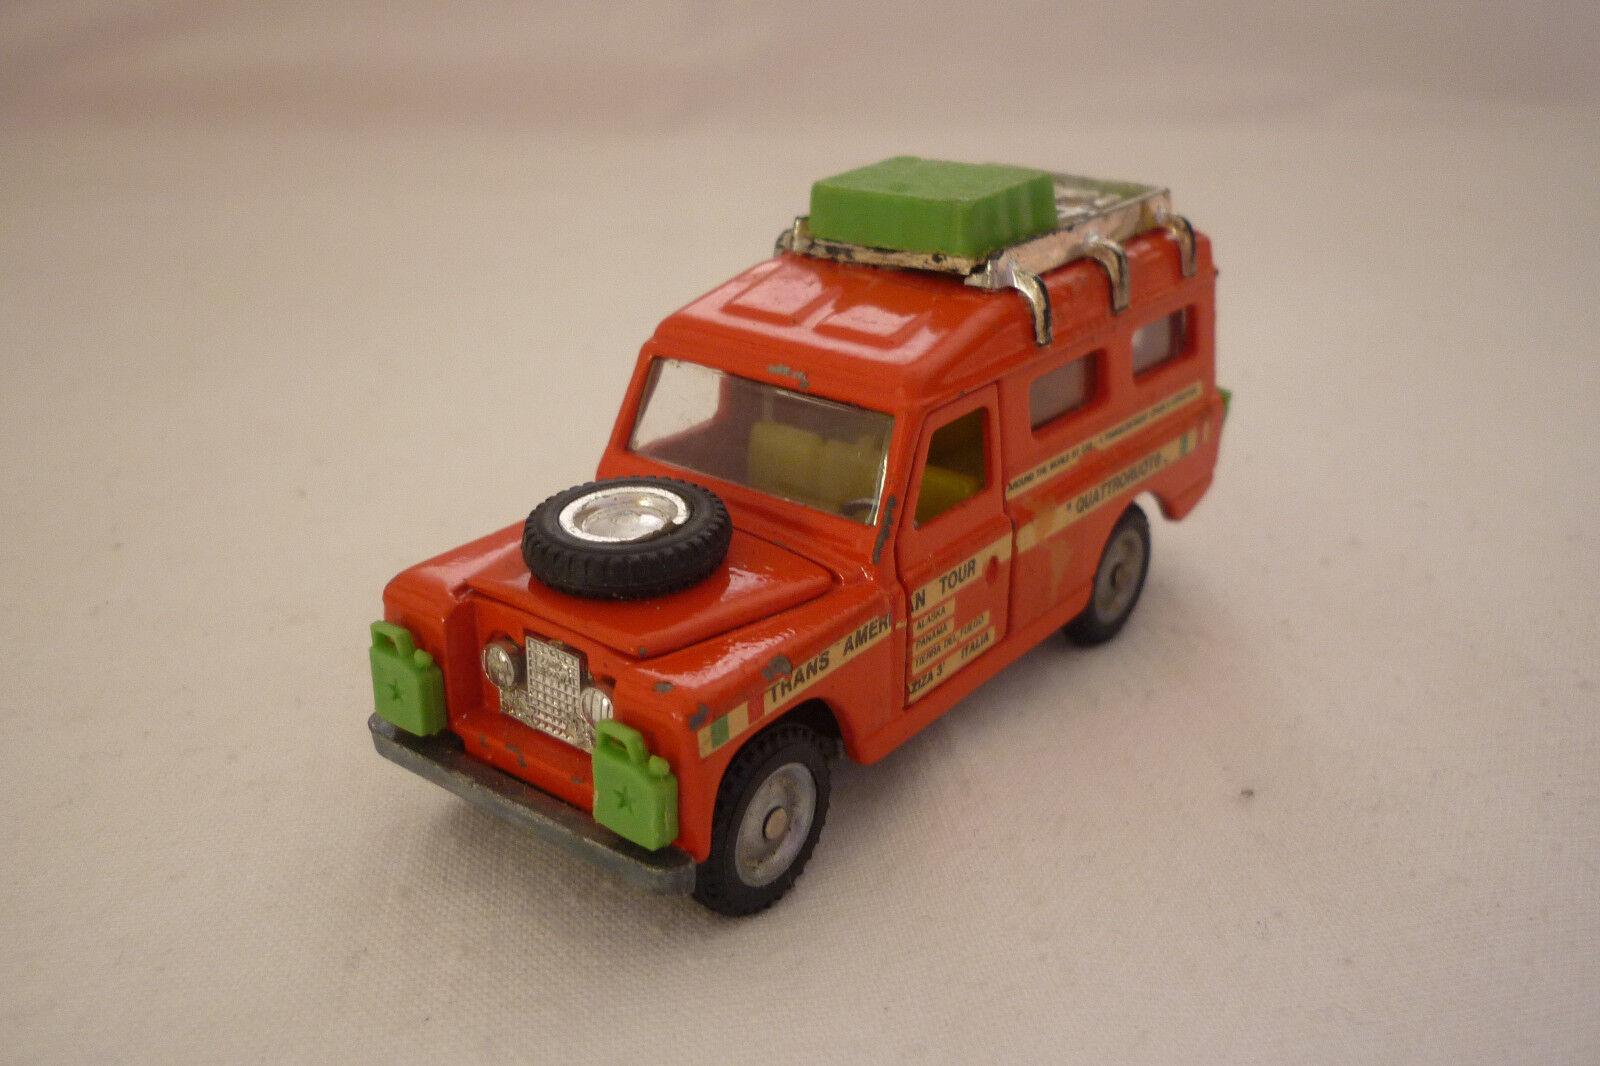 Mebetoys-Vintage Métal Modèle-Land Rover - 1 43 - (mebet 2)